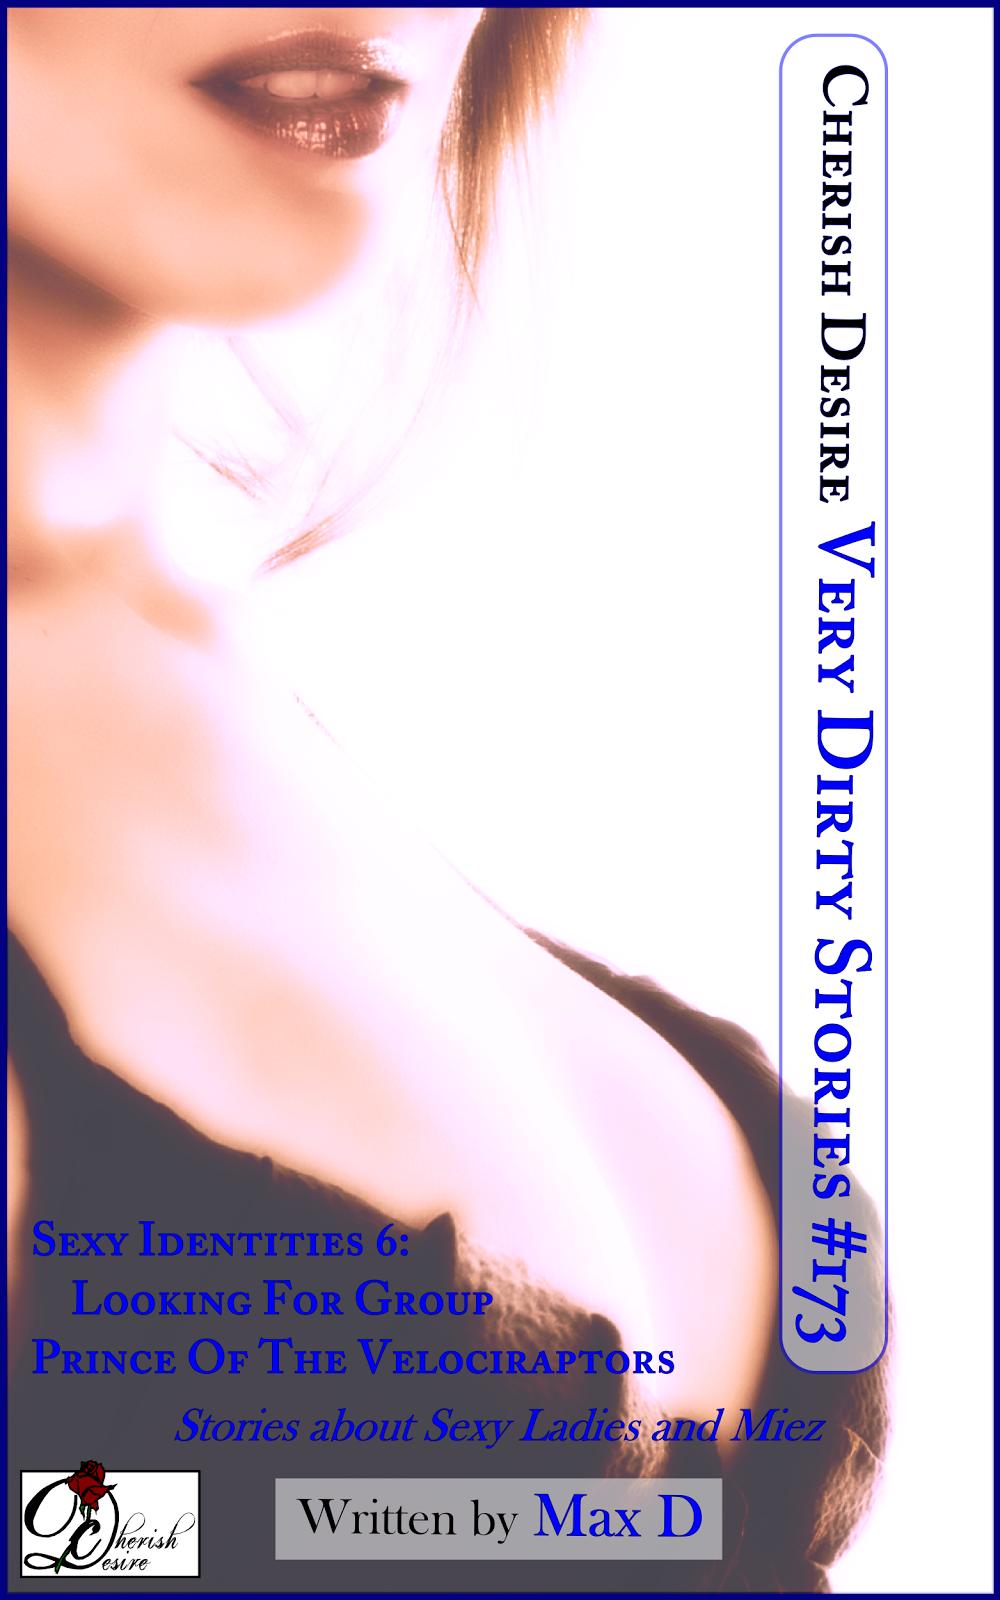 Cherish Desire: Very Dirty Stories #173, Max D, erotica